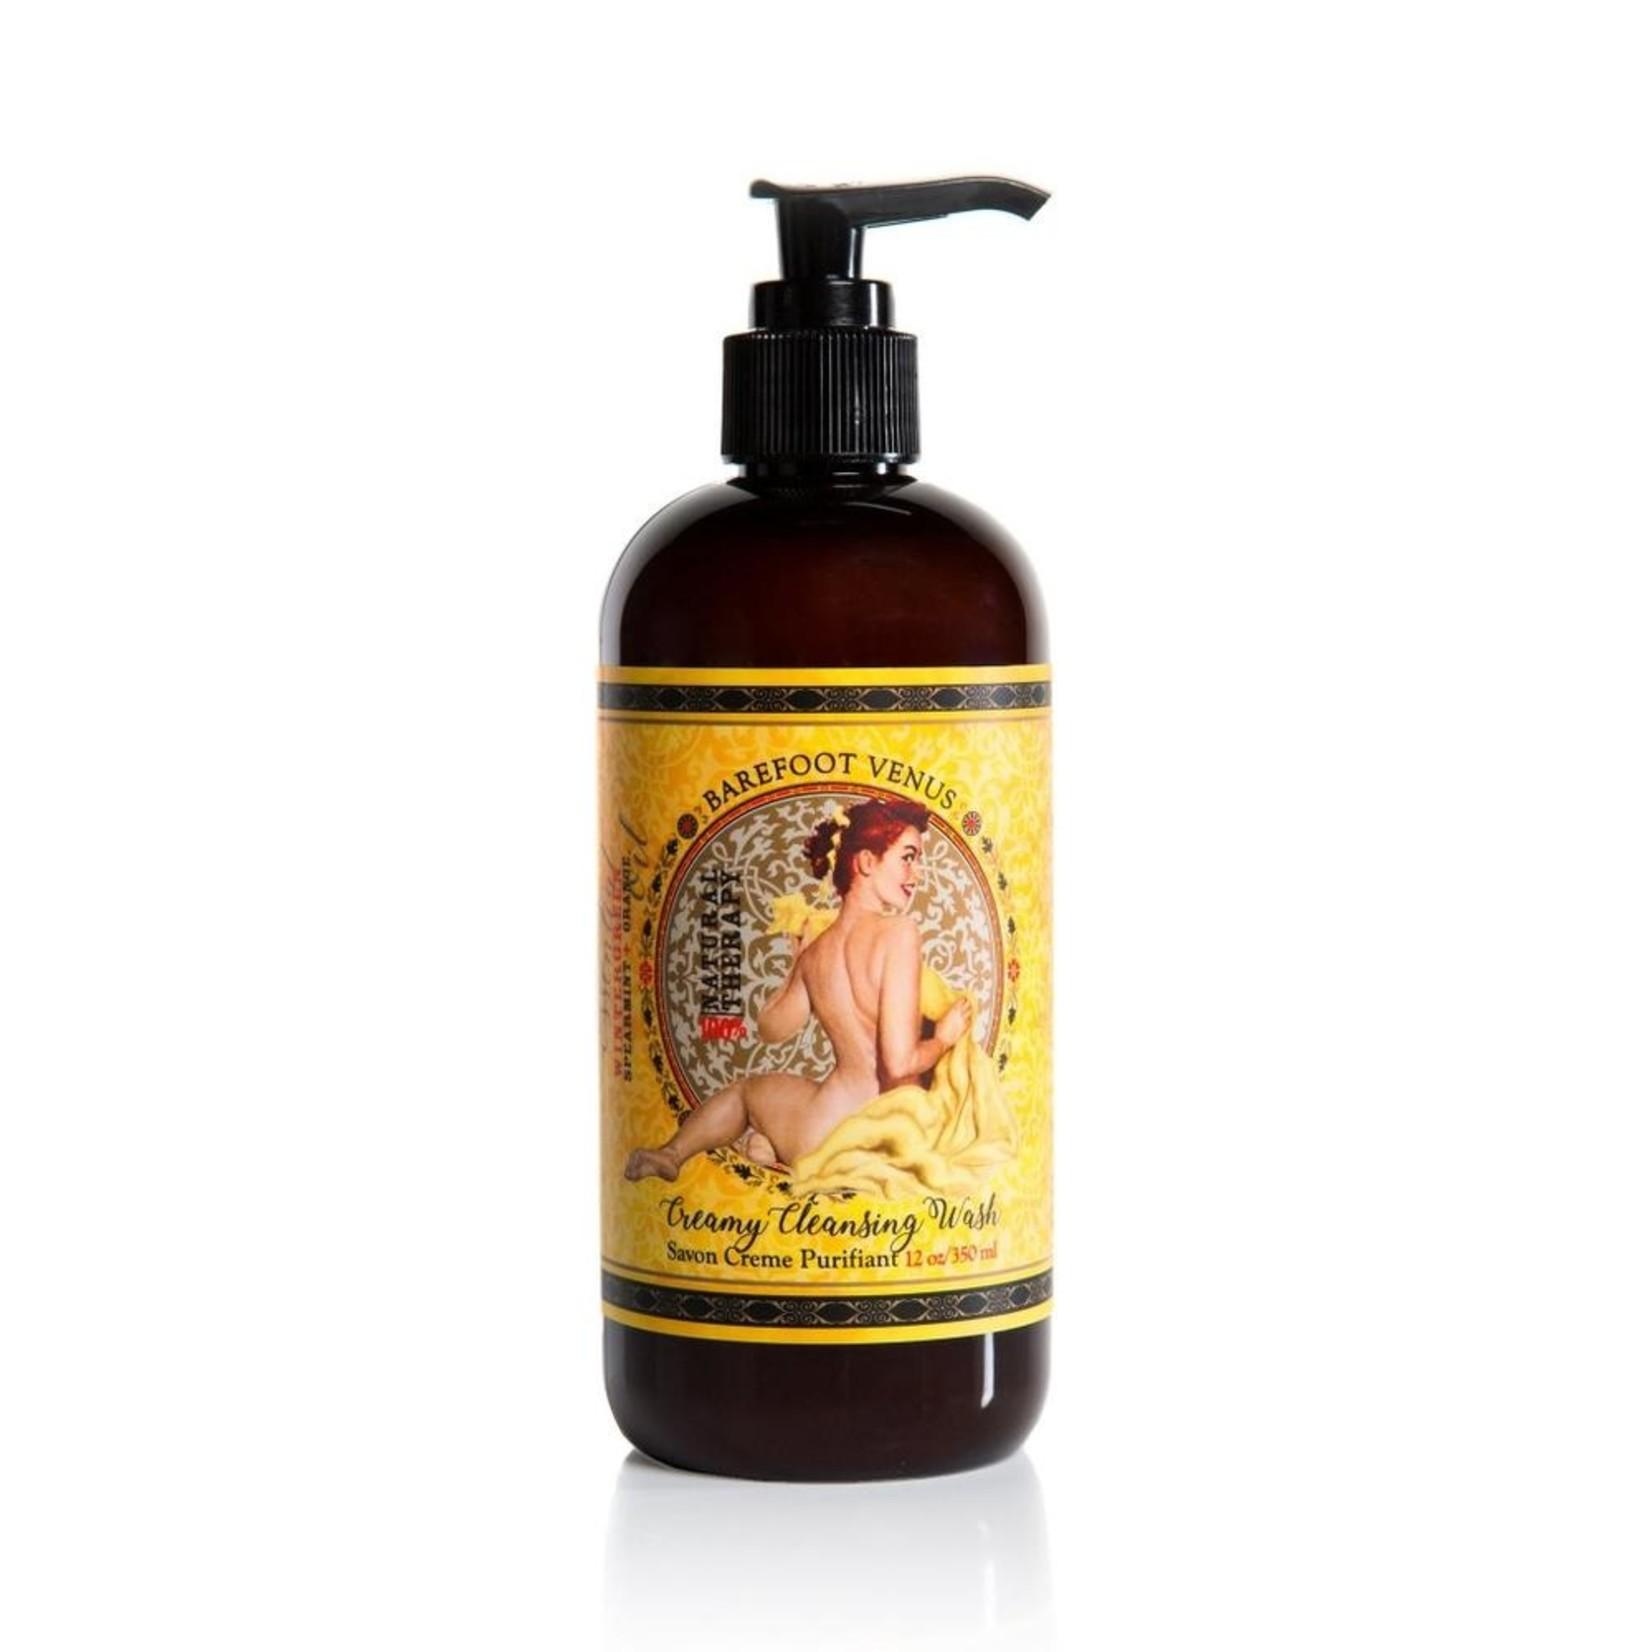 Barefoot Venus Essential Oil ~ Creamy Cleansing Wash